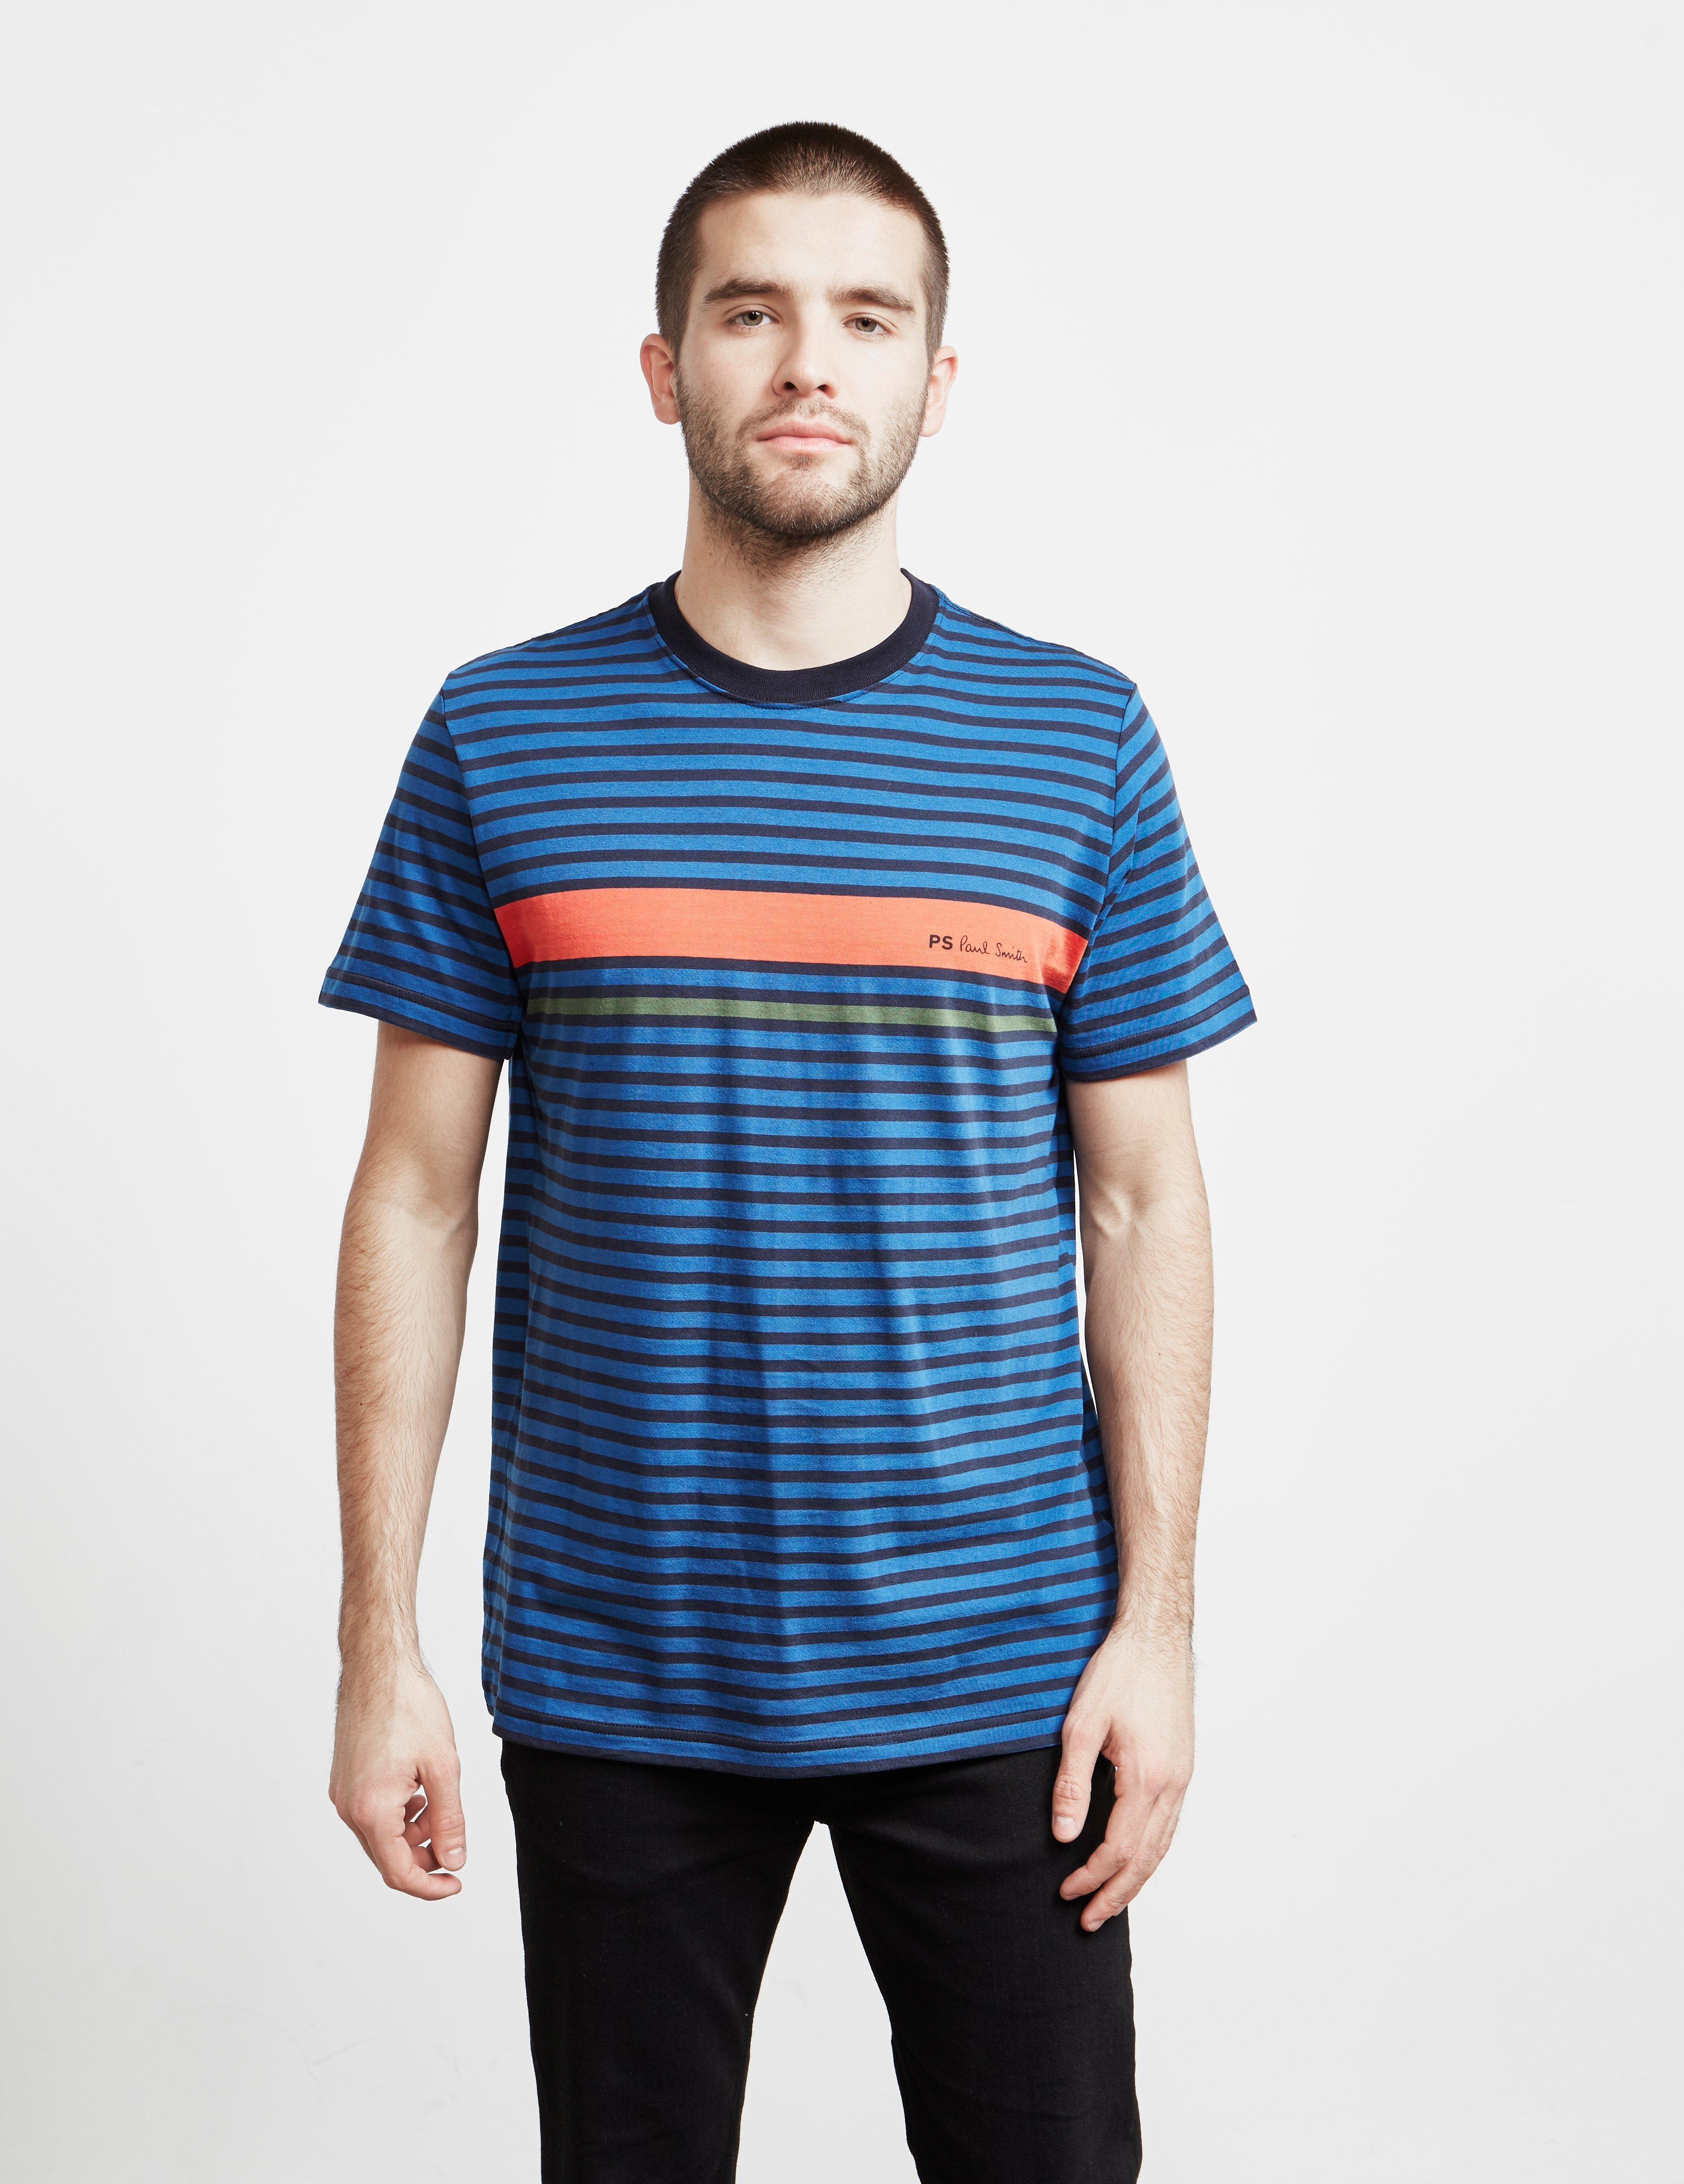 b7493870c9 Lyst - Ps By Paul Smith Mens Stripe Logo Short Sleeve T-shirt Navy ...